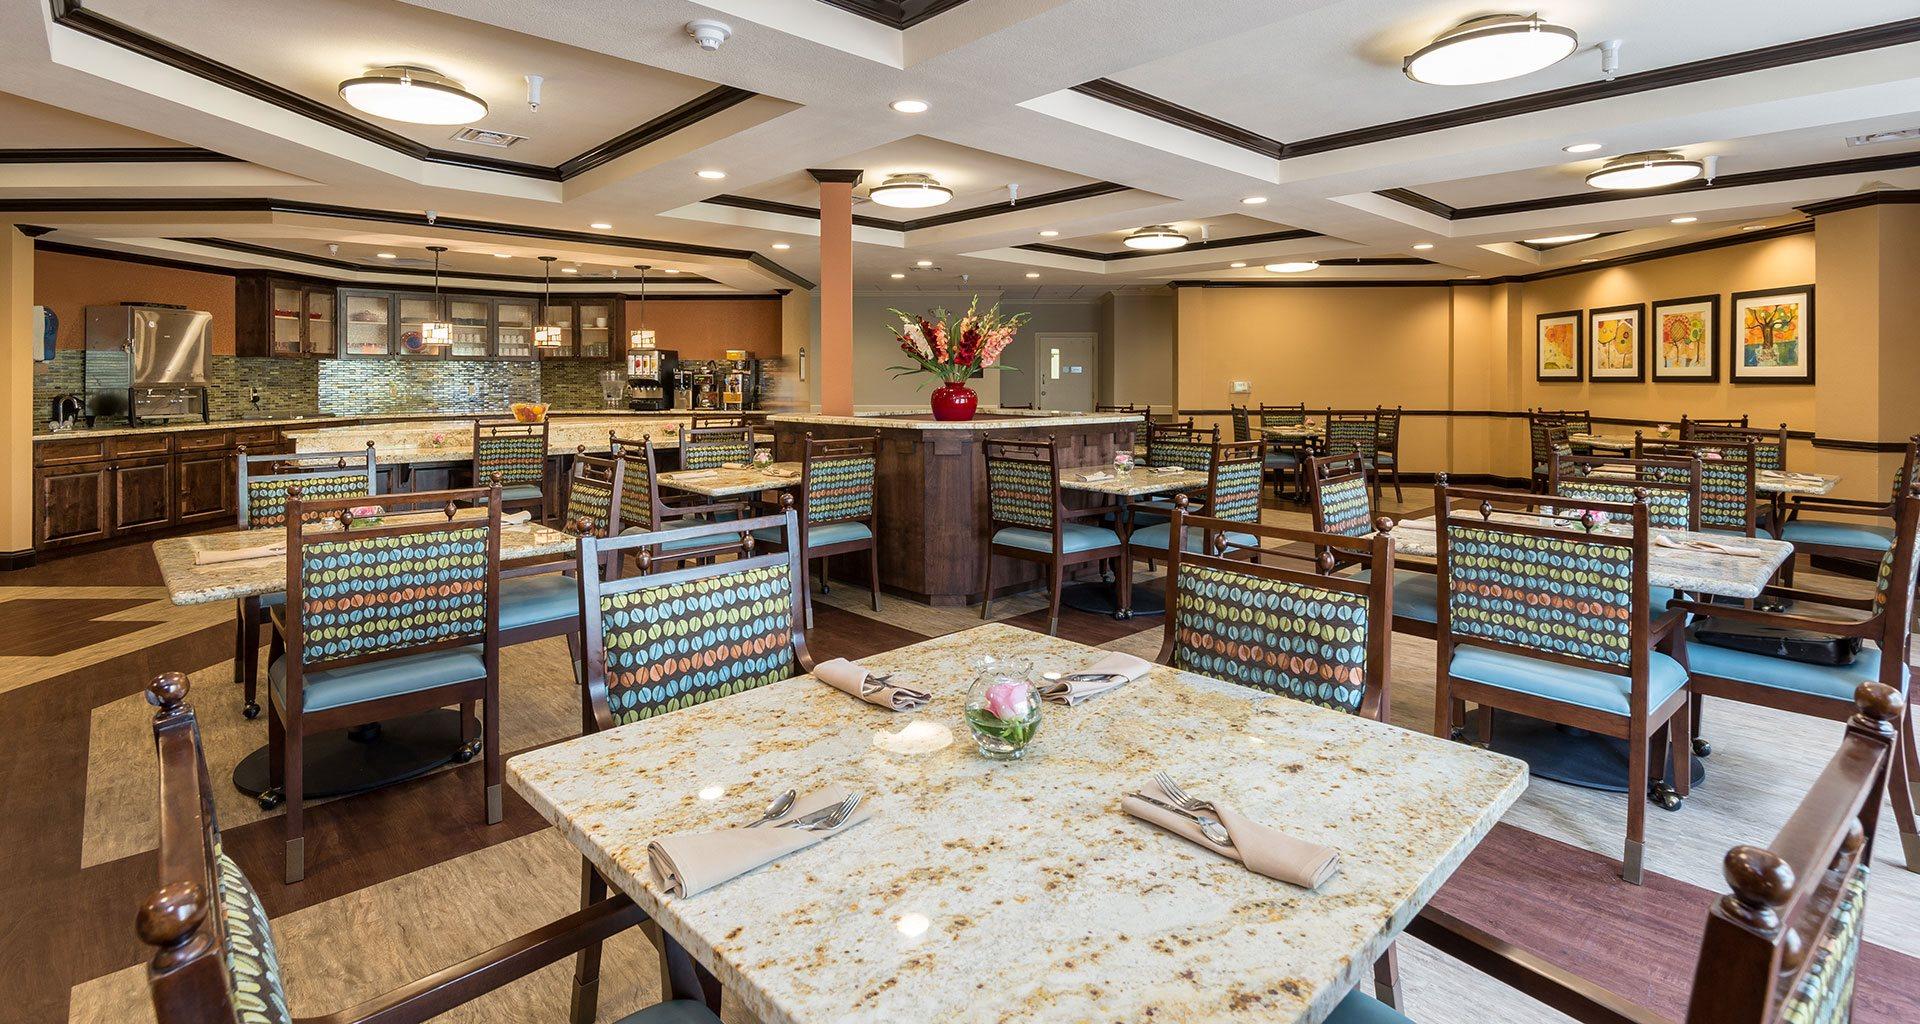 Private dining room at Pacifica Senior Living Santa Fe, Santa Fe, New Mexico